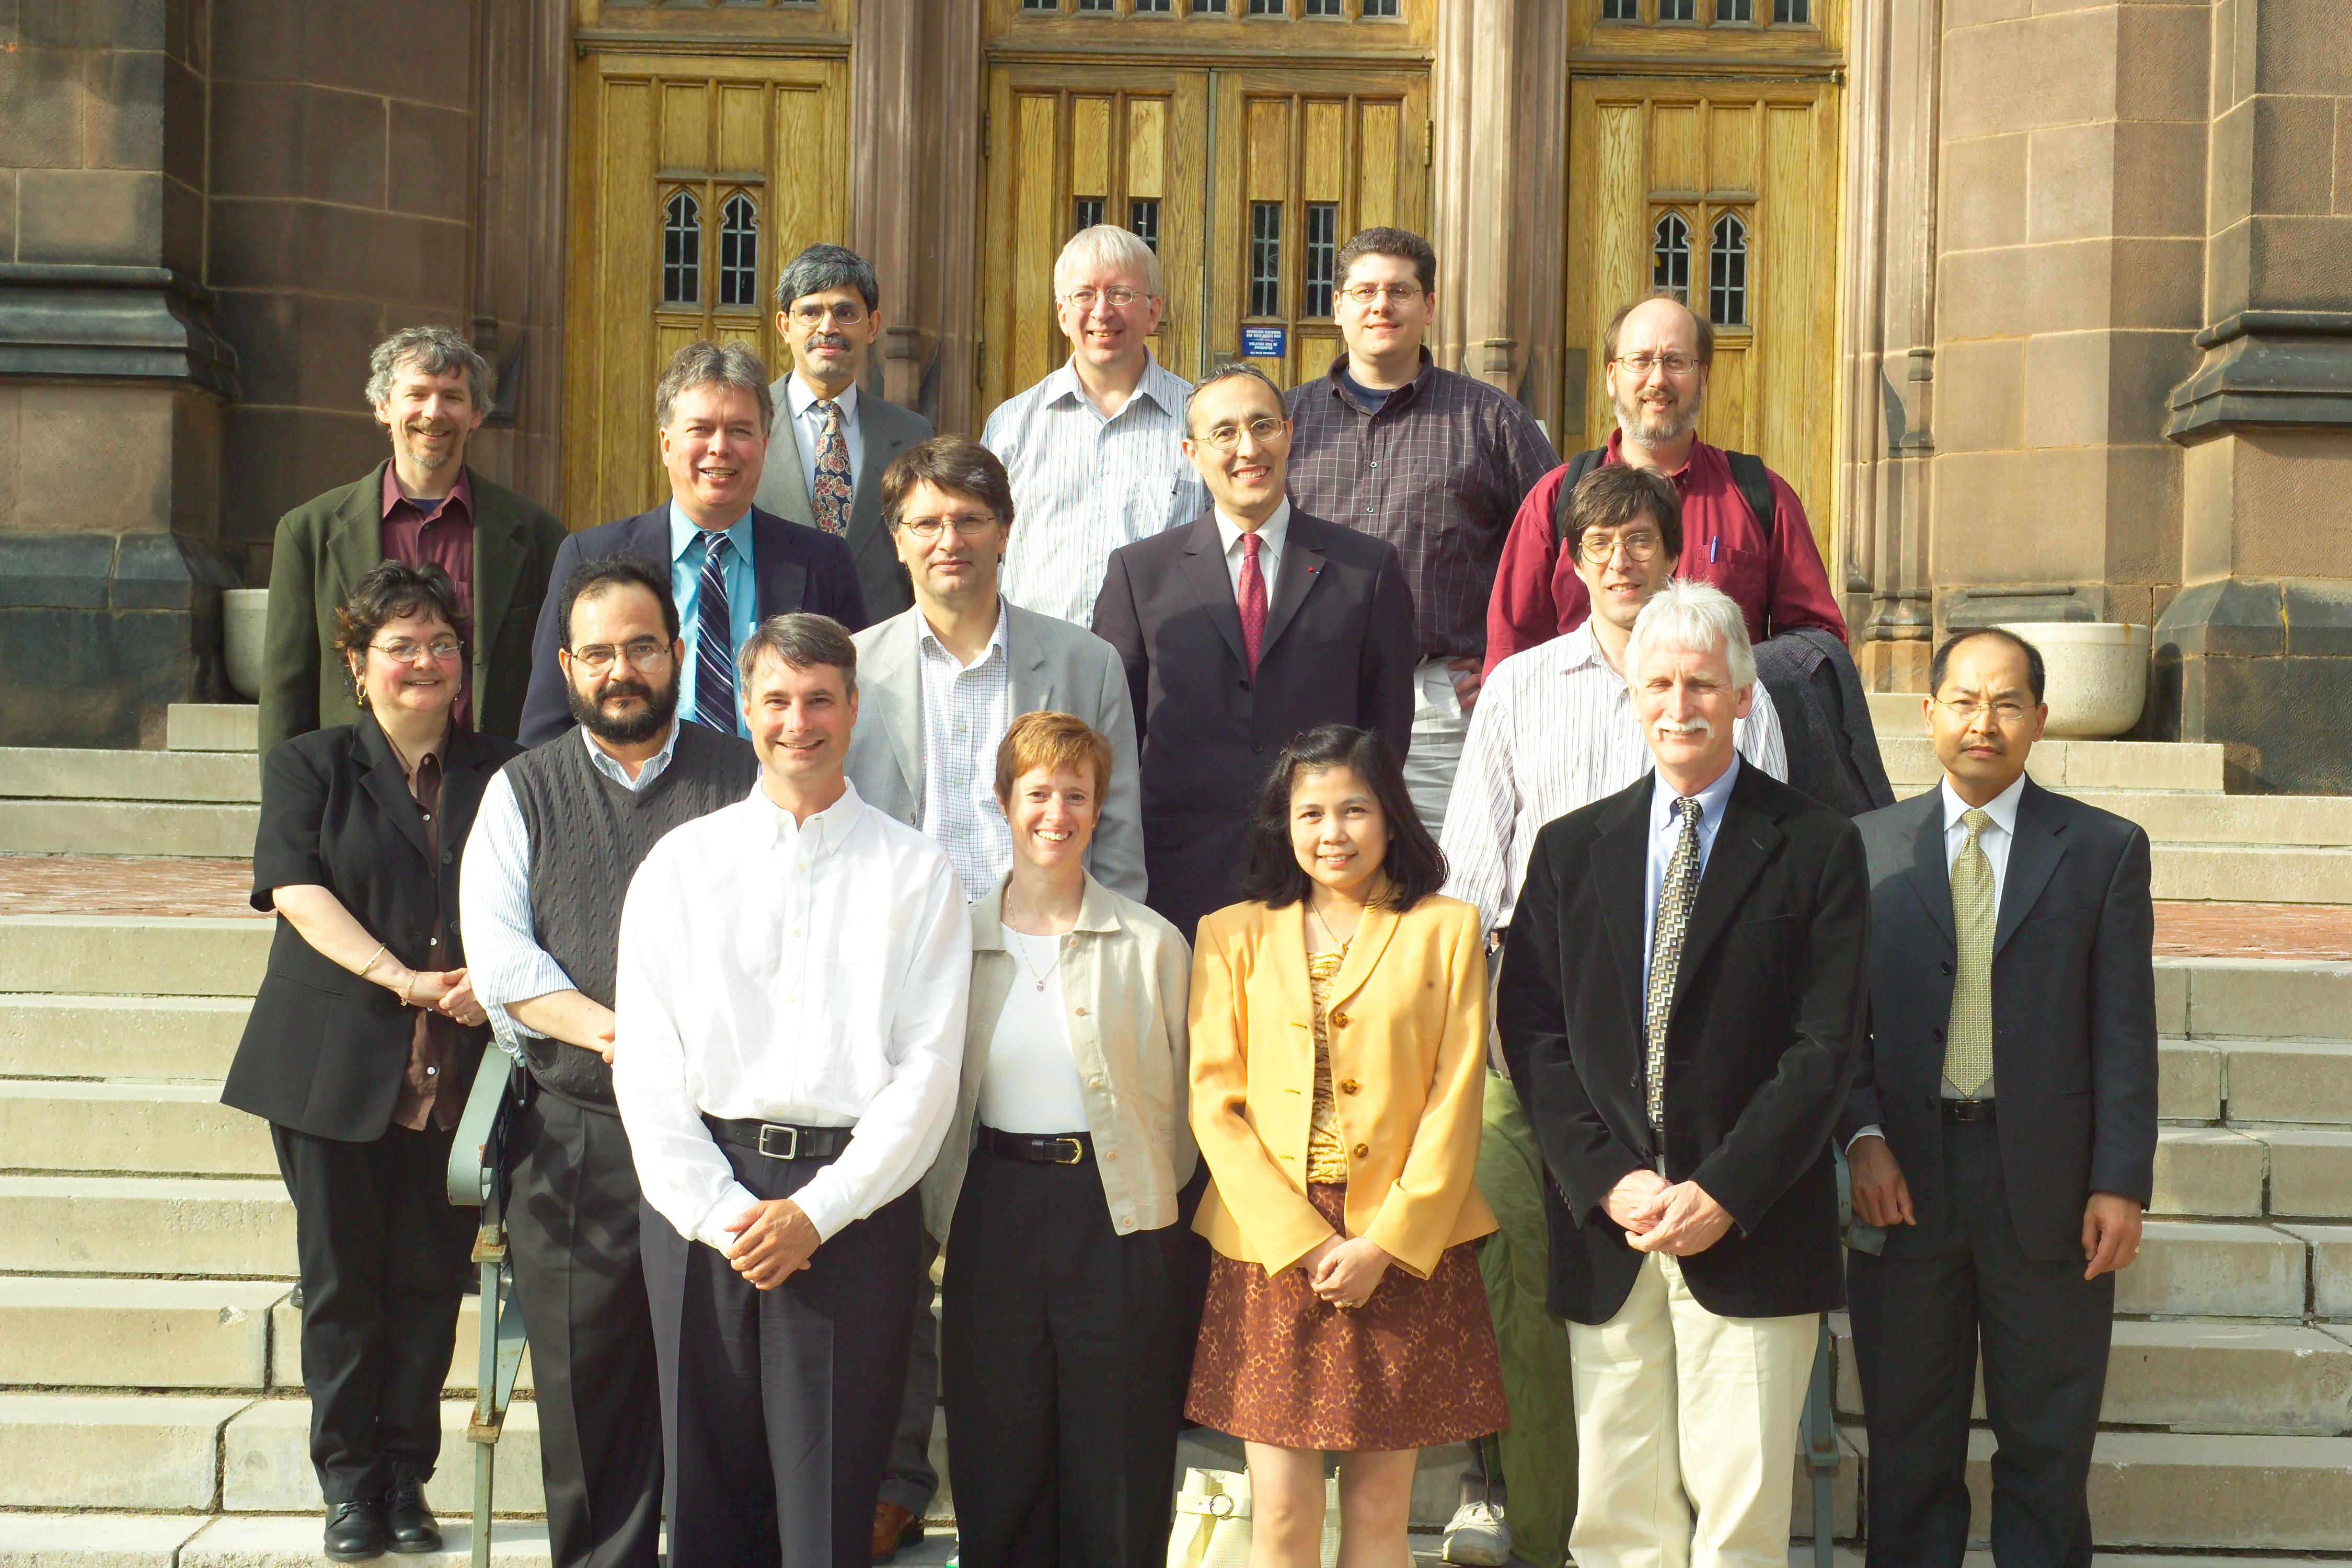 Jorgensen Alumni from Purdue University.